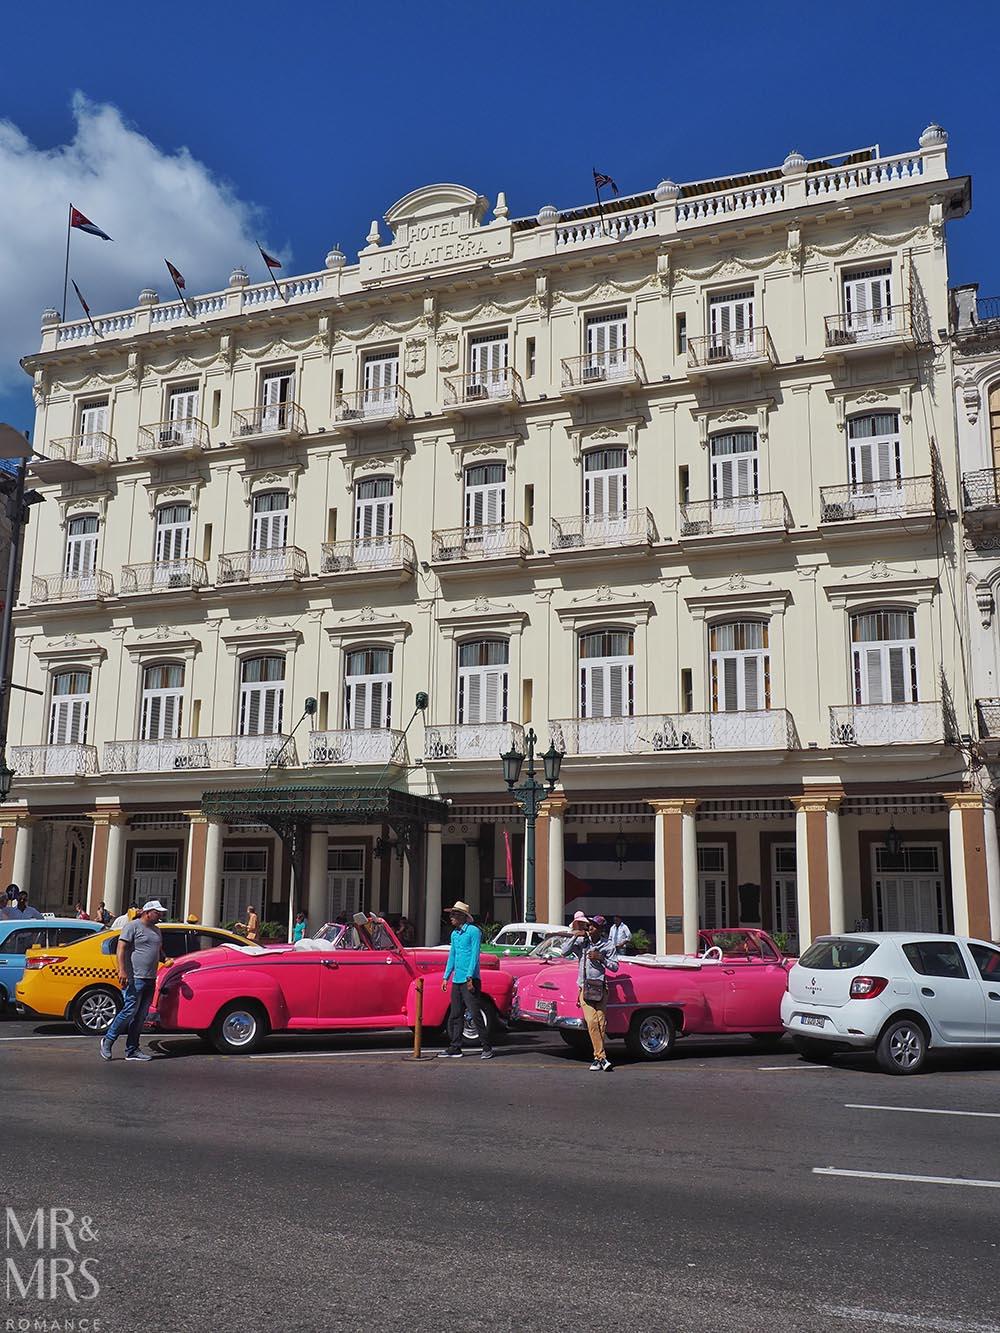 Honeymoon itinerary Cuba - Hotel Ingleterra Havana